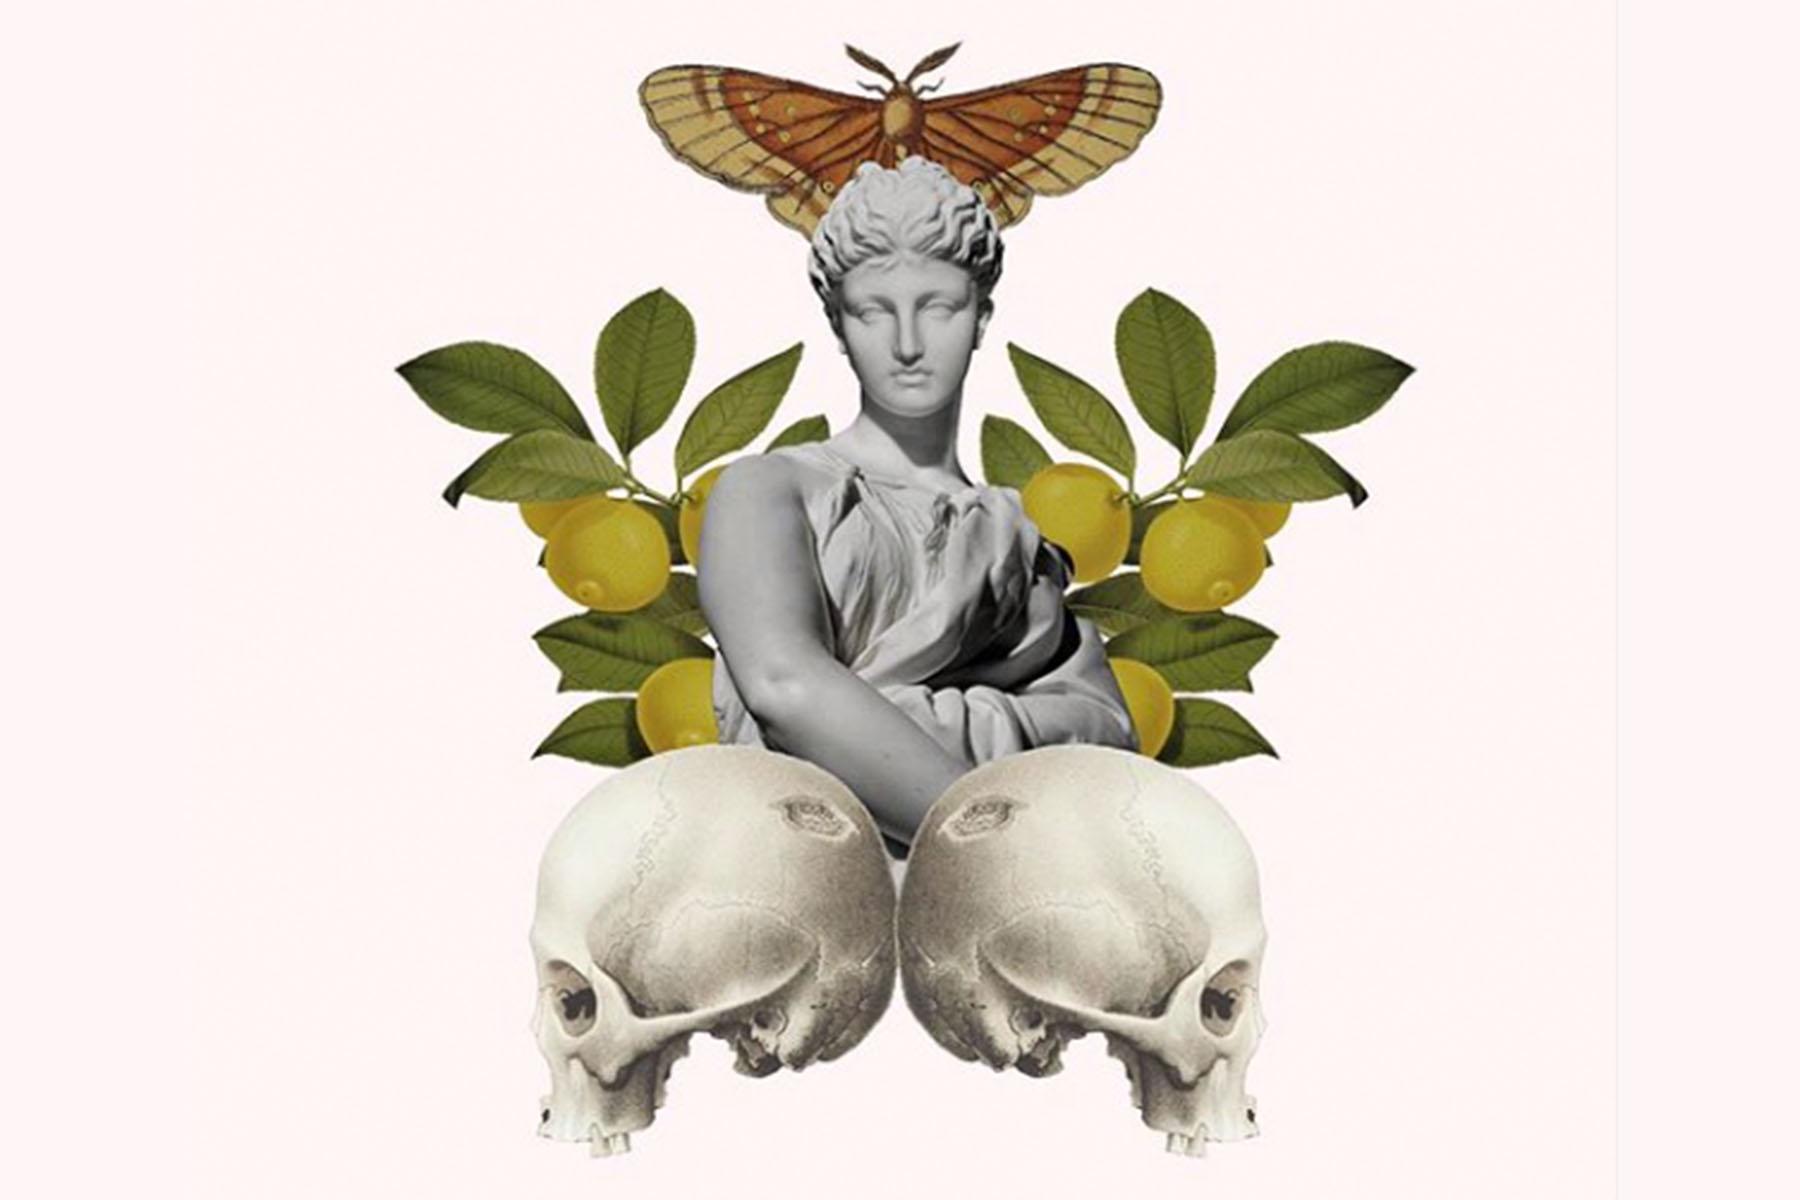 Weekly Horoscope: Here Comes Capricorn Season